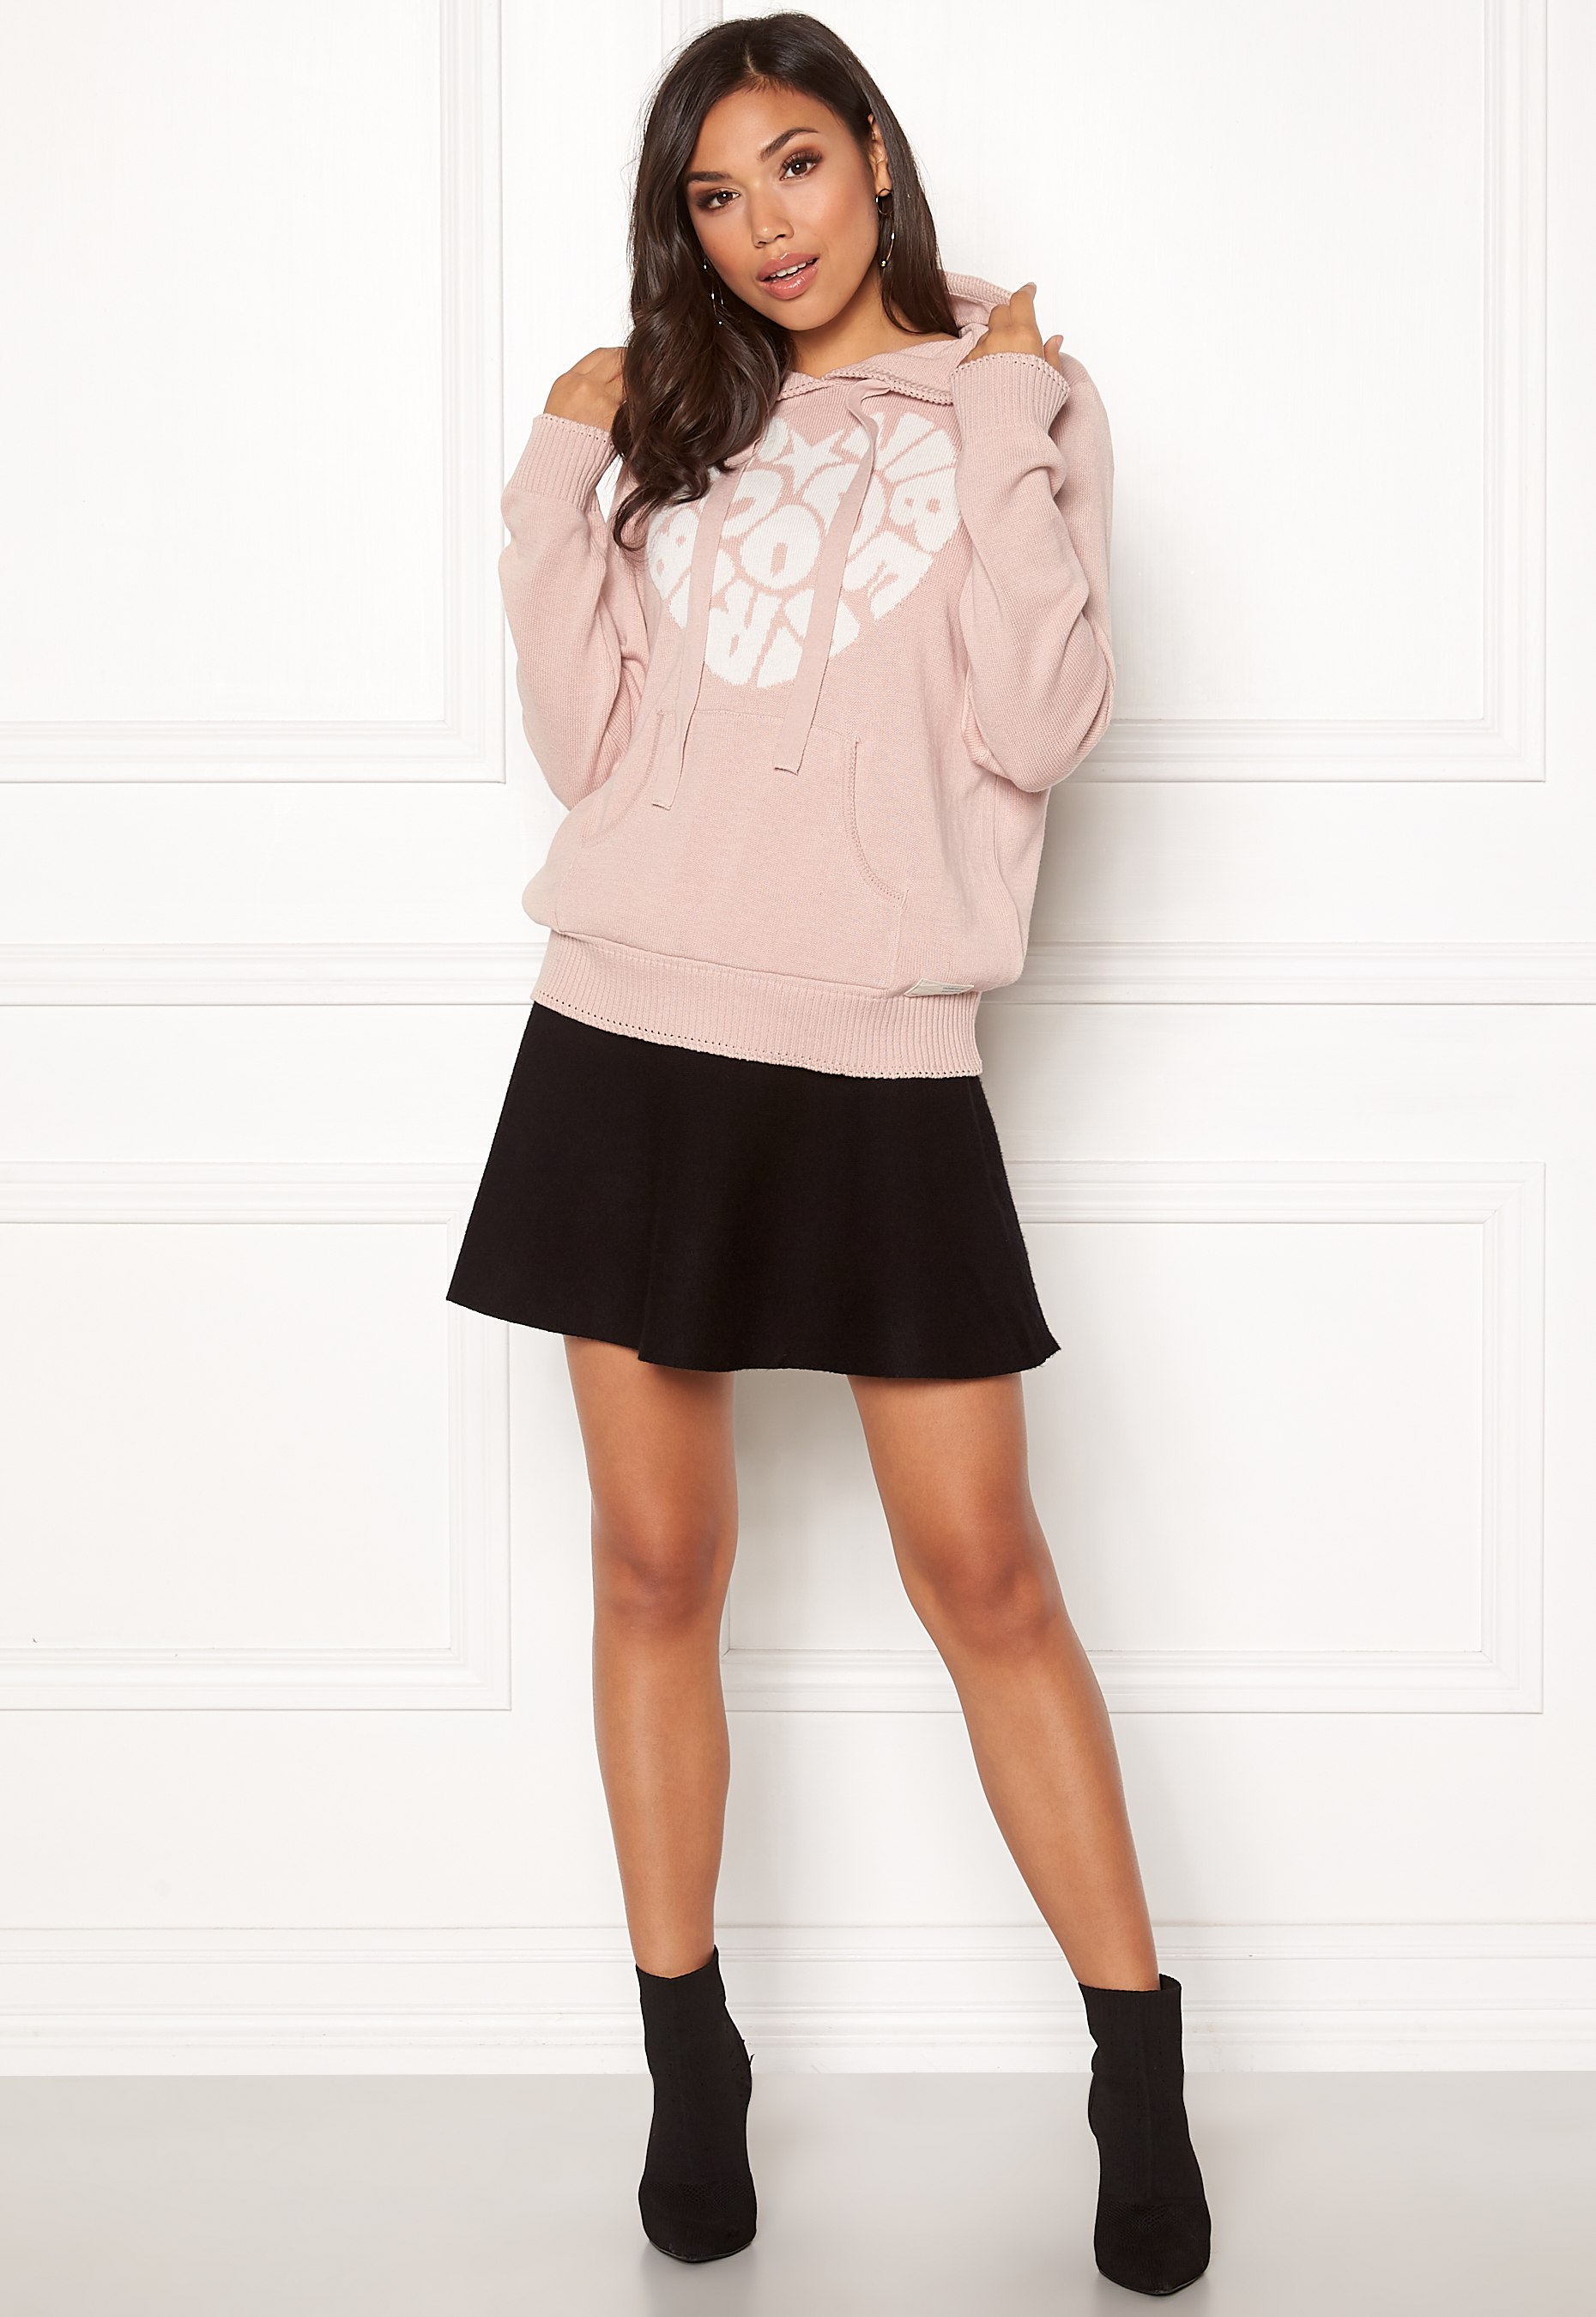 051b0a318ad3 Odd Molly Hey Baby Hood Sweater Pink Sand - Bubbleroom